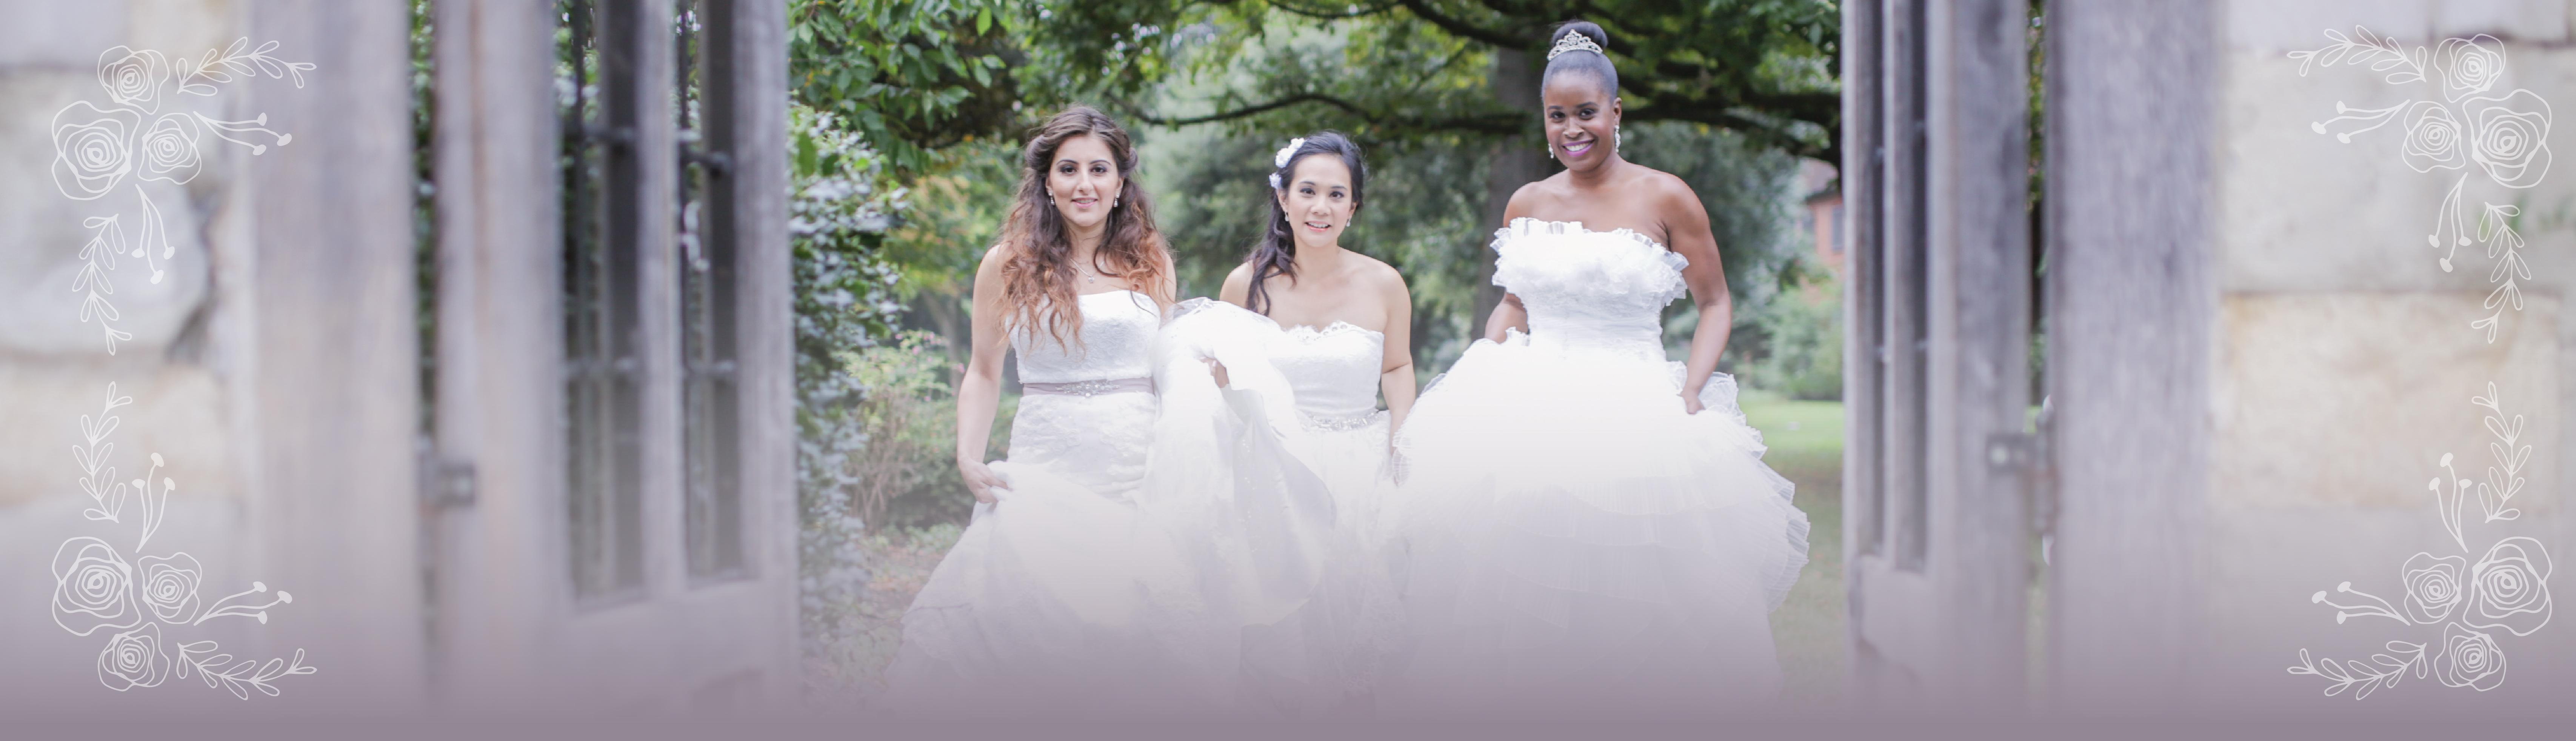 Wedding dress shop in croydon south london lace wedding dresses tulle wedding dresses buy wedding dresses in croydon